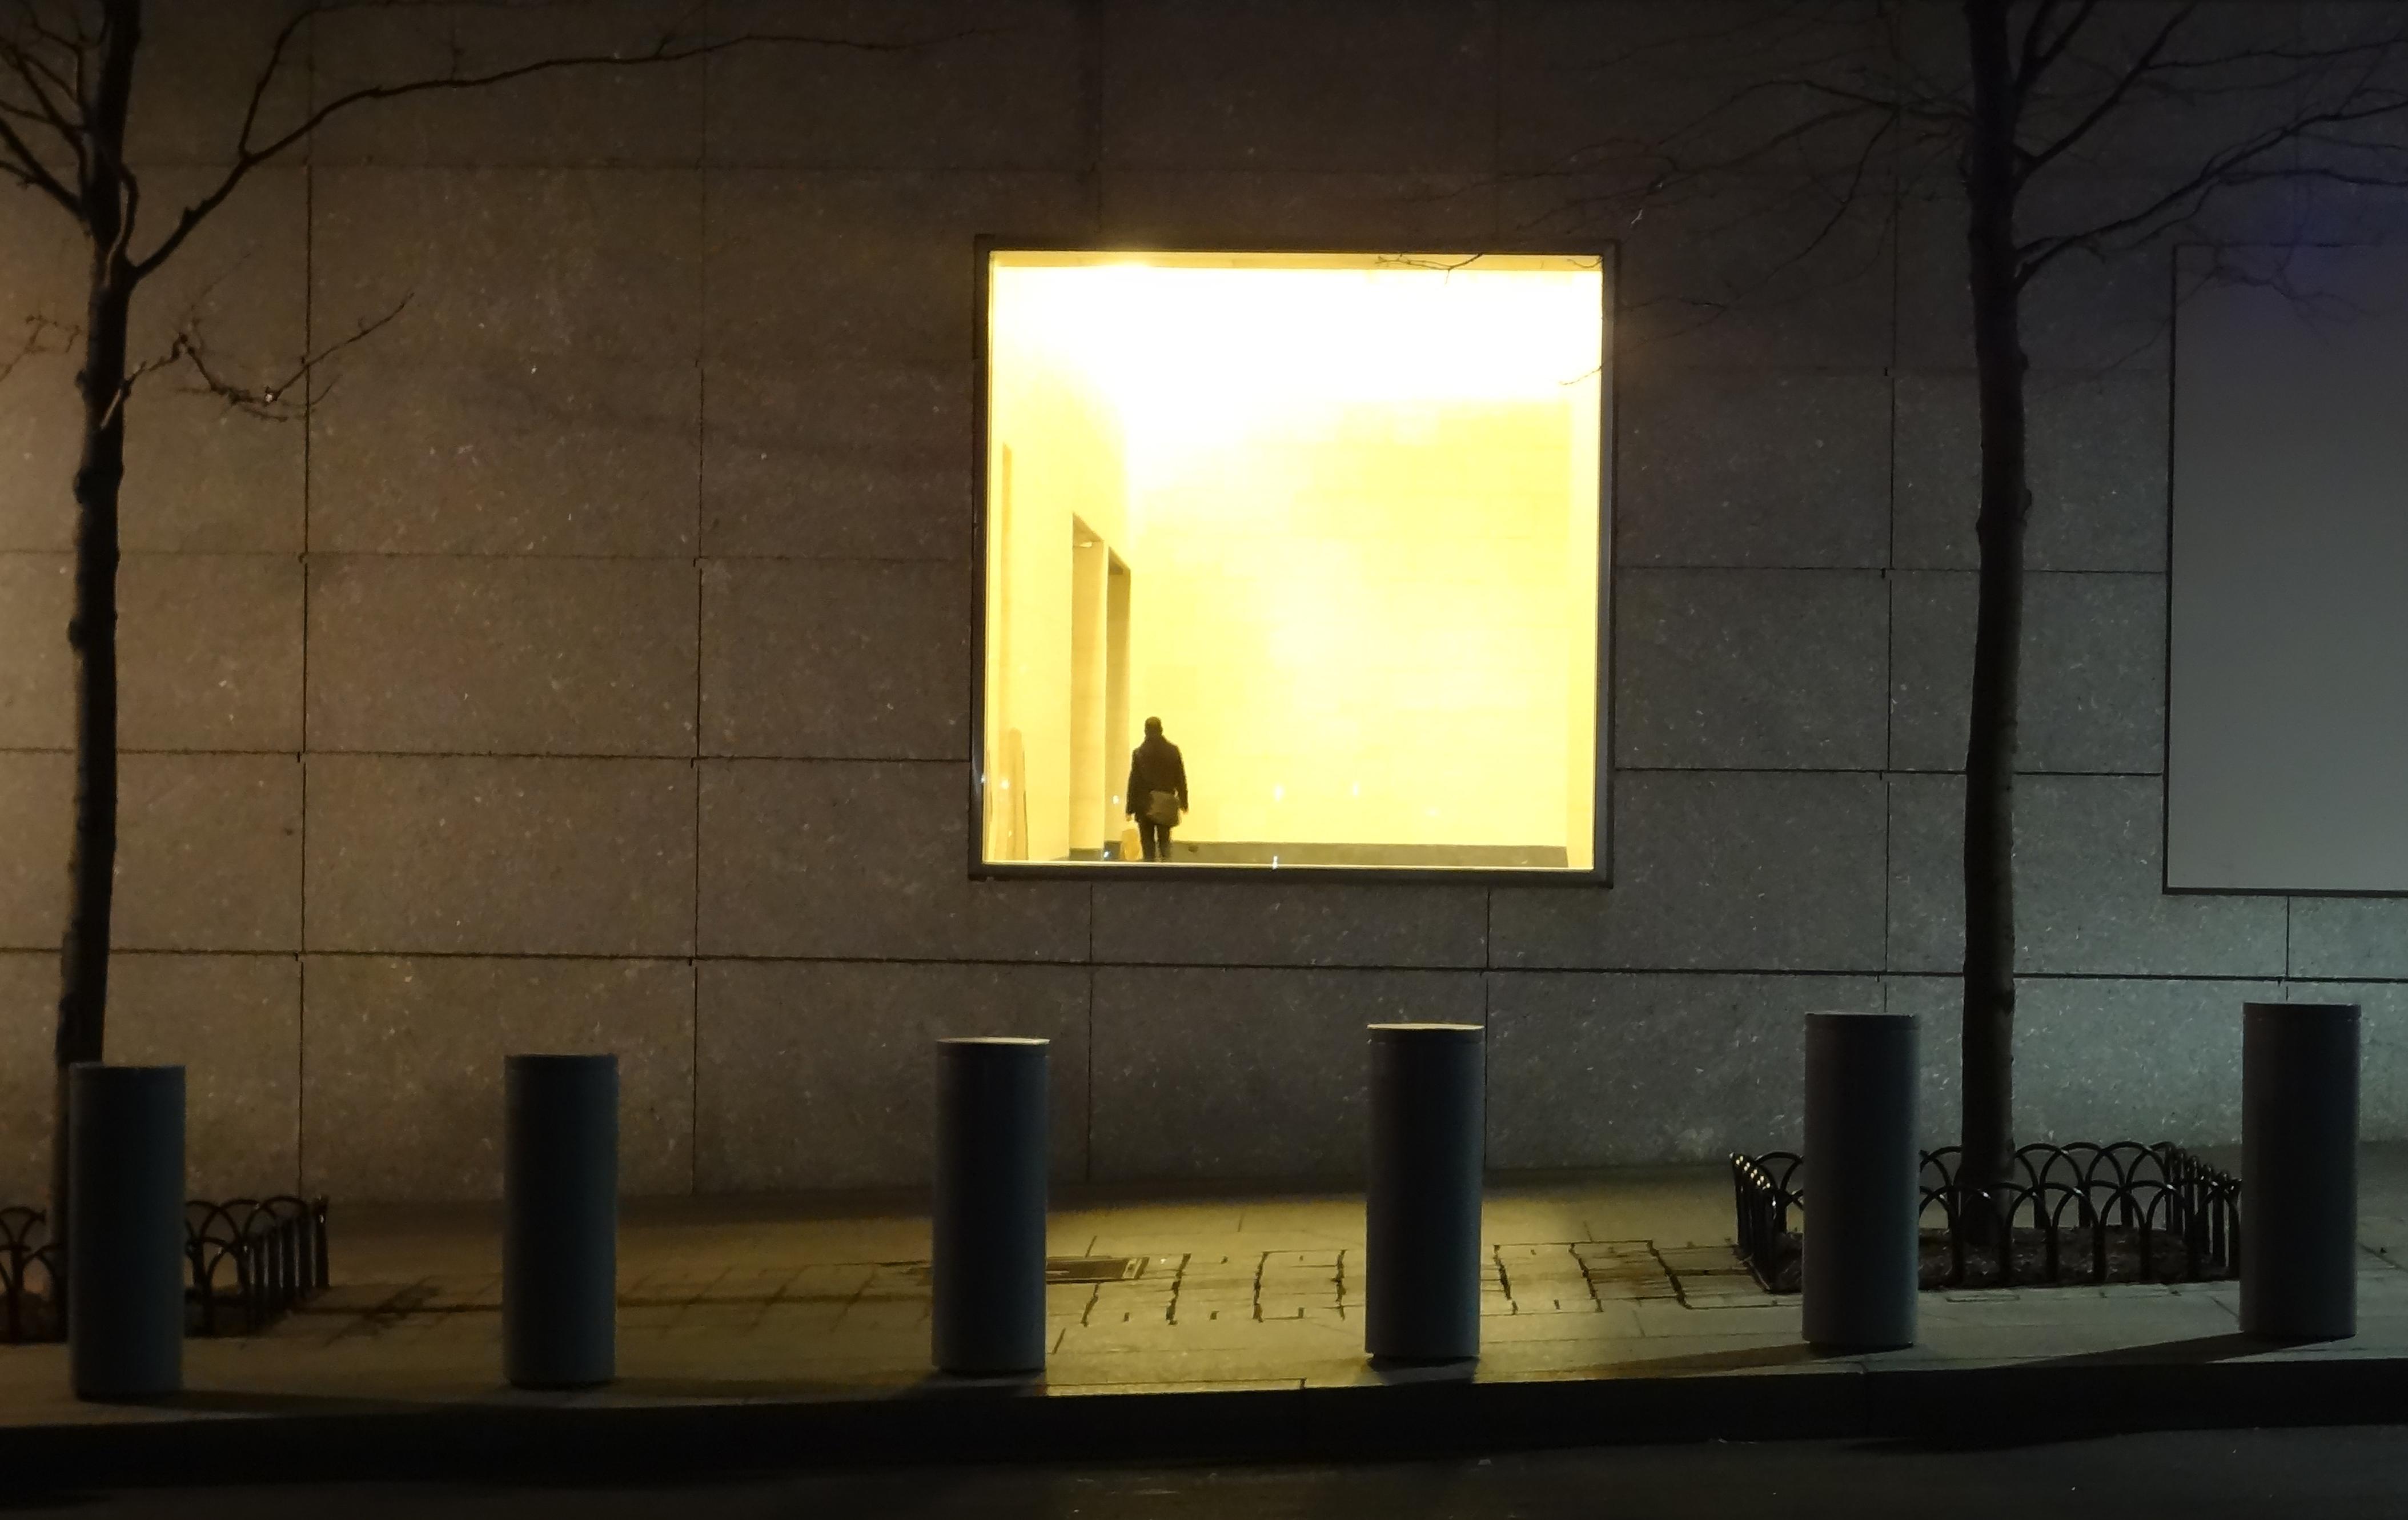 Goldman Sachs Murray Street window